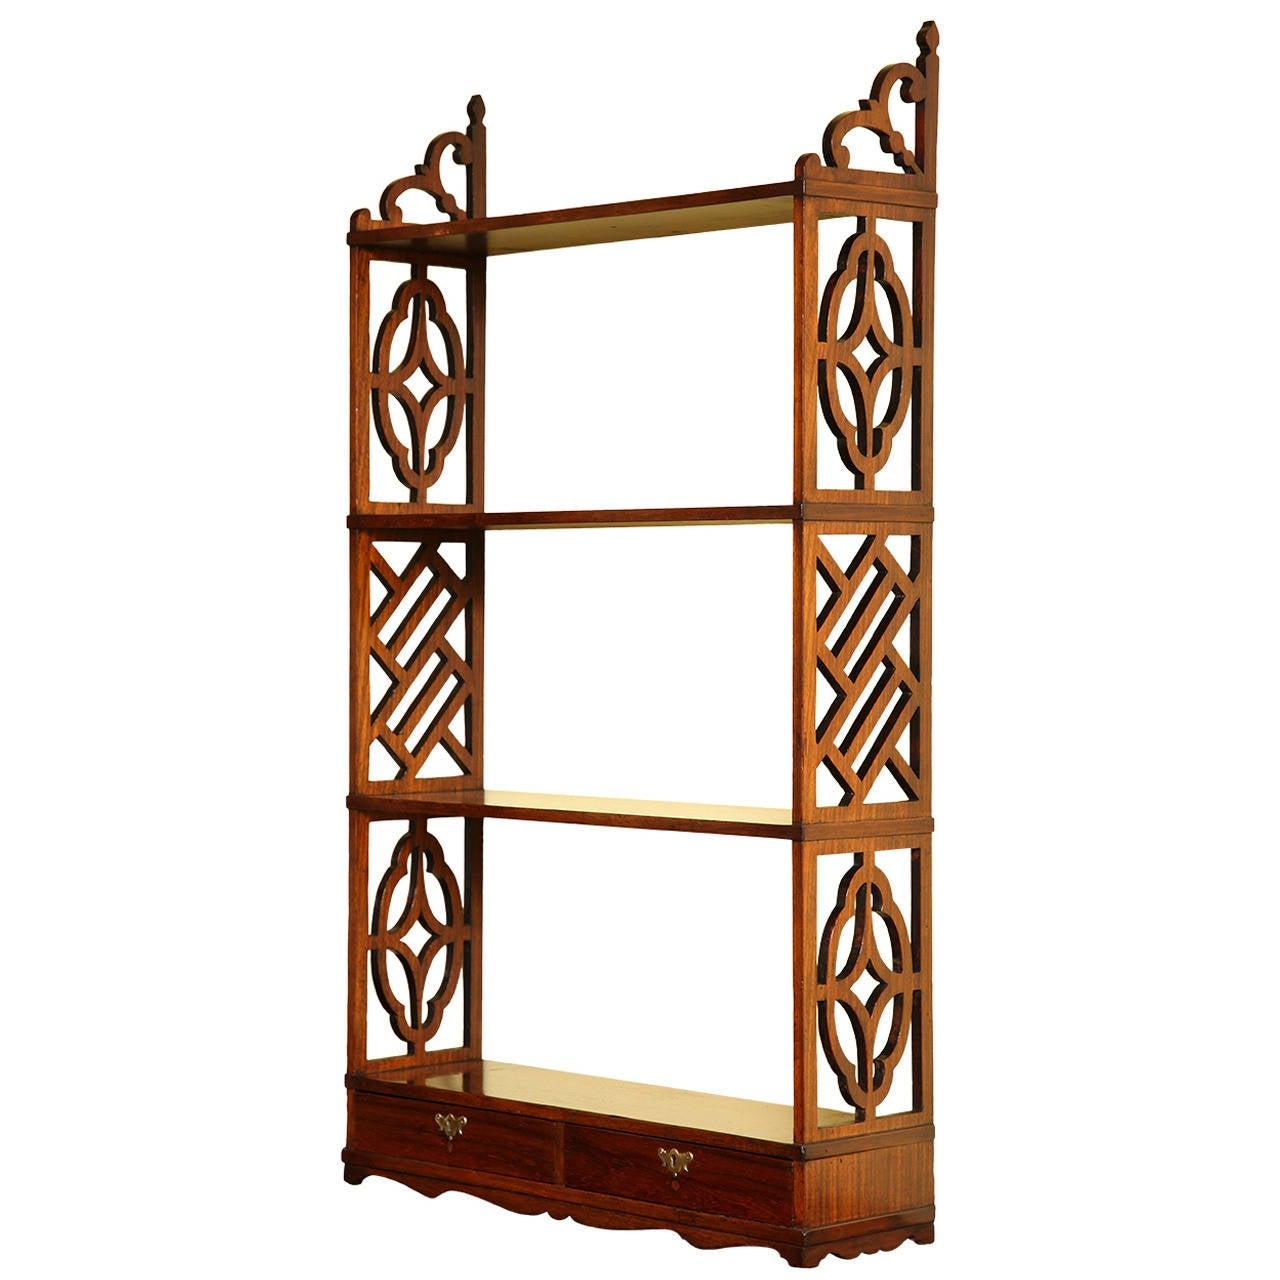 rare chinese chippendale rosewood fretwork open bookshelf english 1